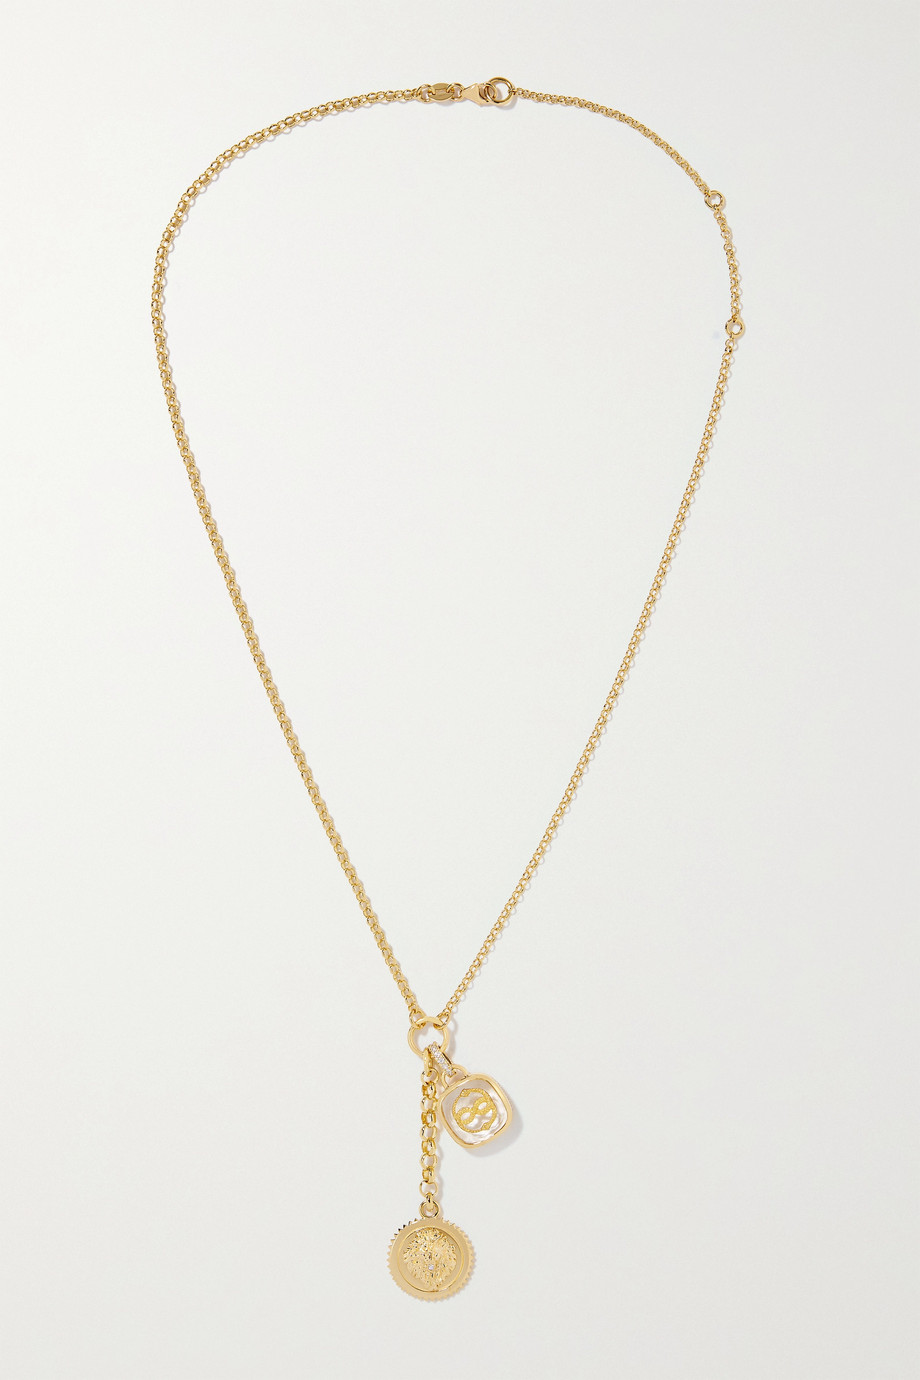 Foundrae Wholeness and Strength 18-karat gold, quartz and diamond necklace